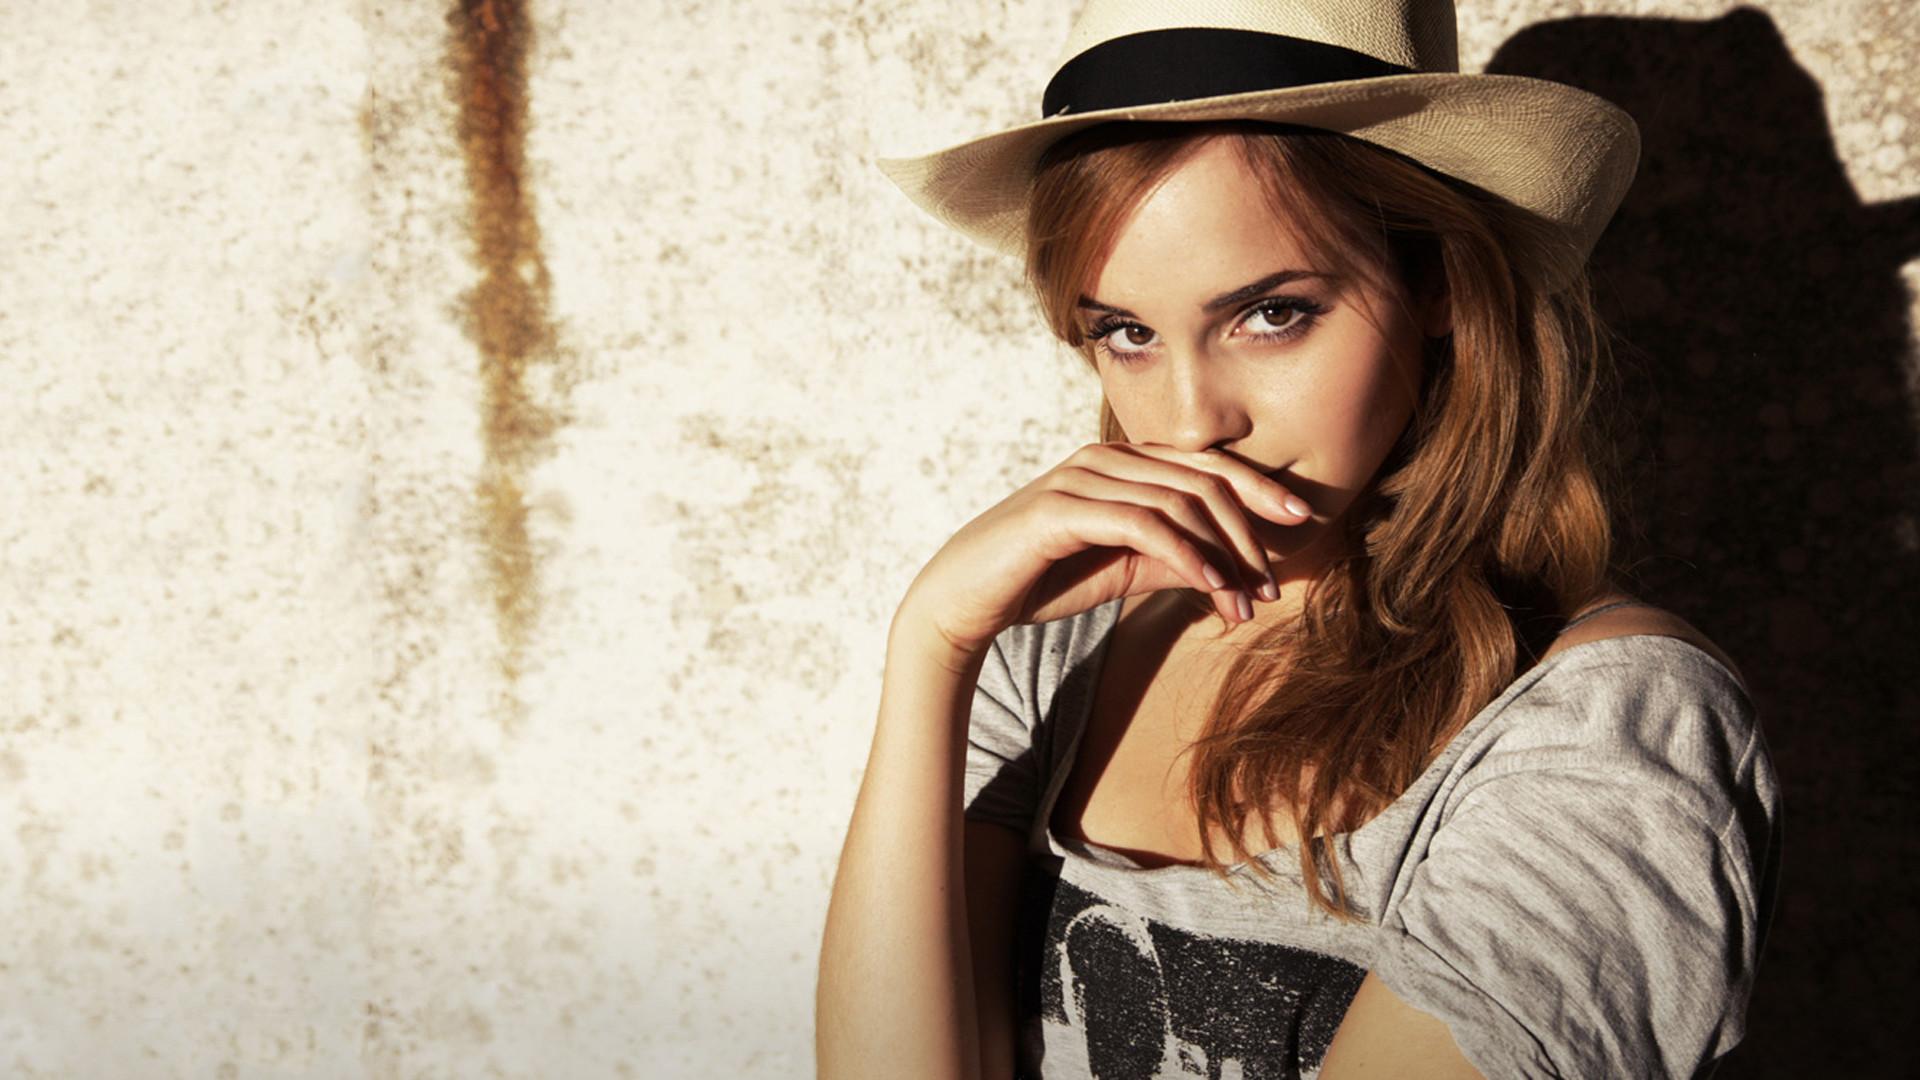 Emma Watson Wallpaper, HD, 1080p, Full HD   Celebrity and Movie .